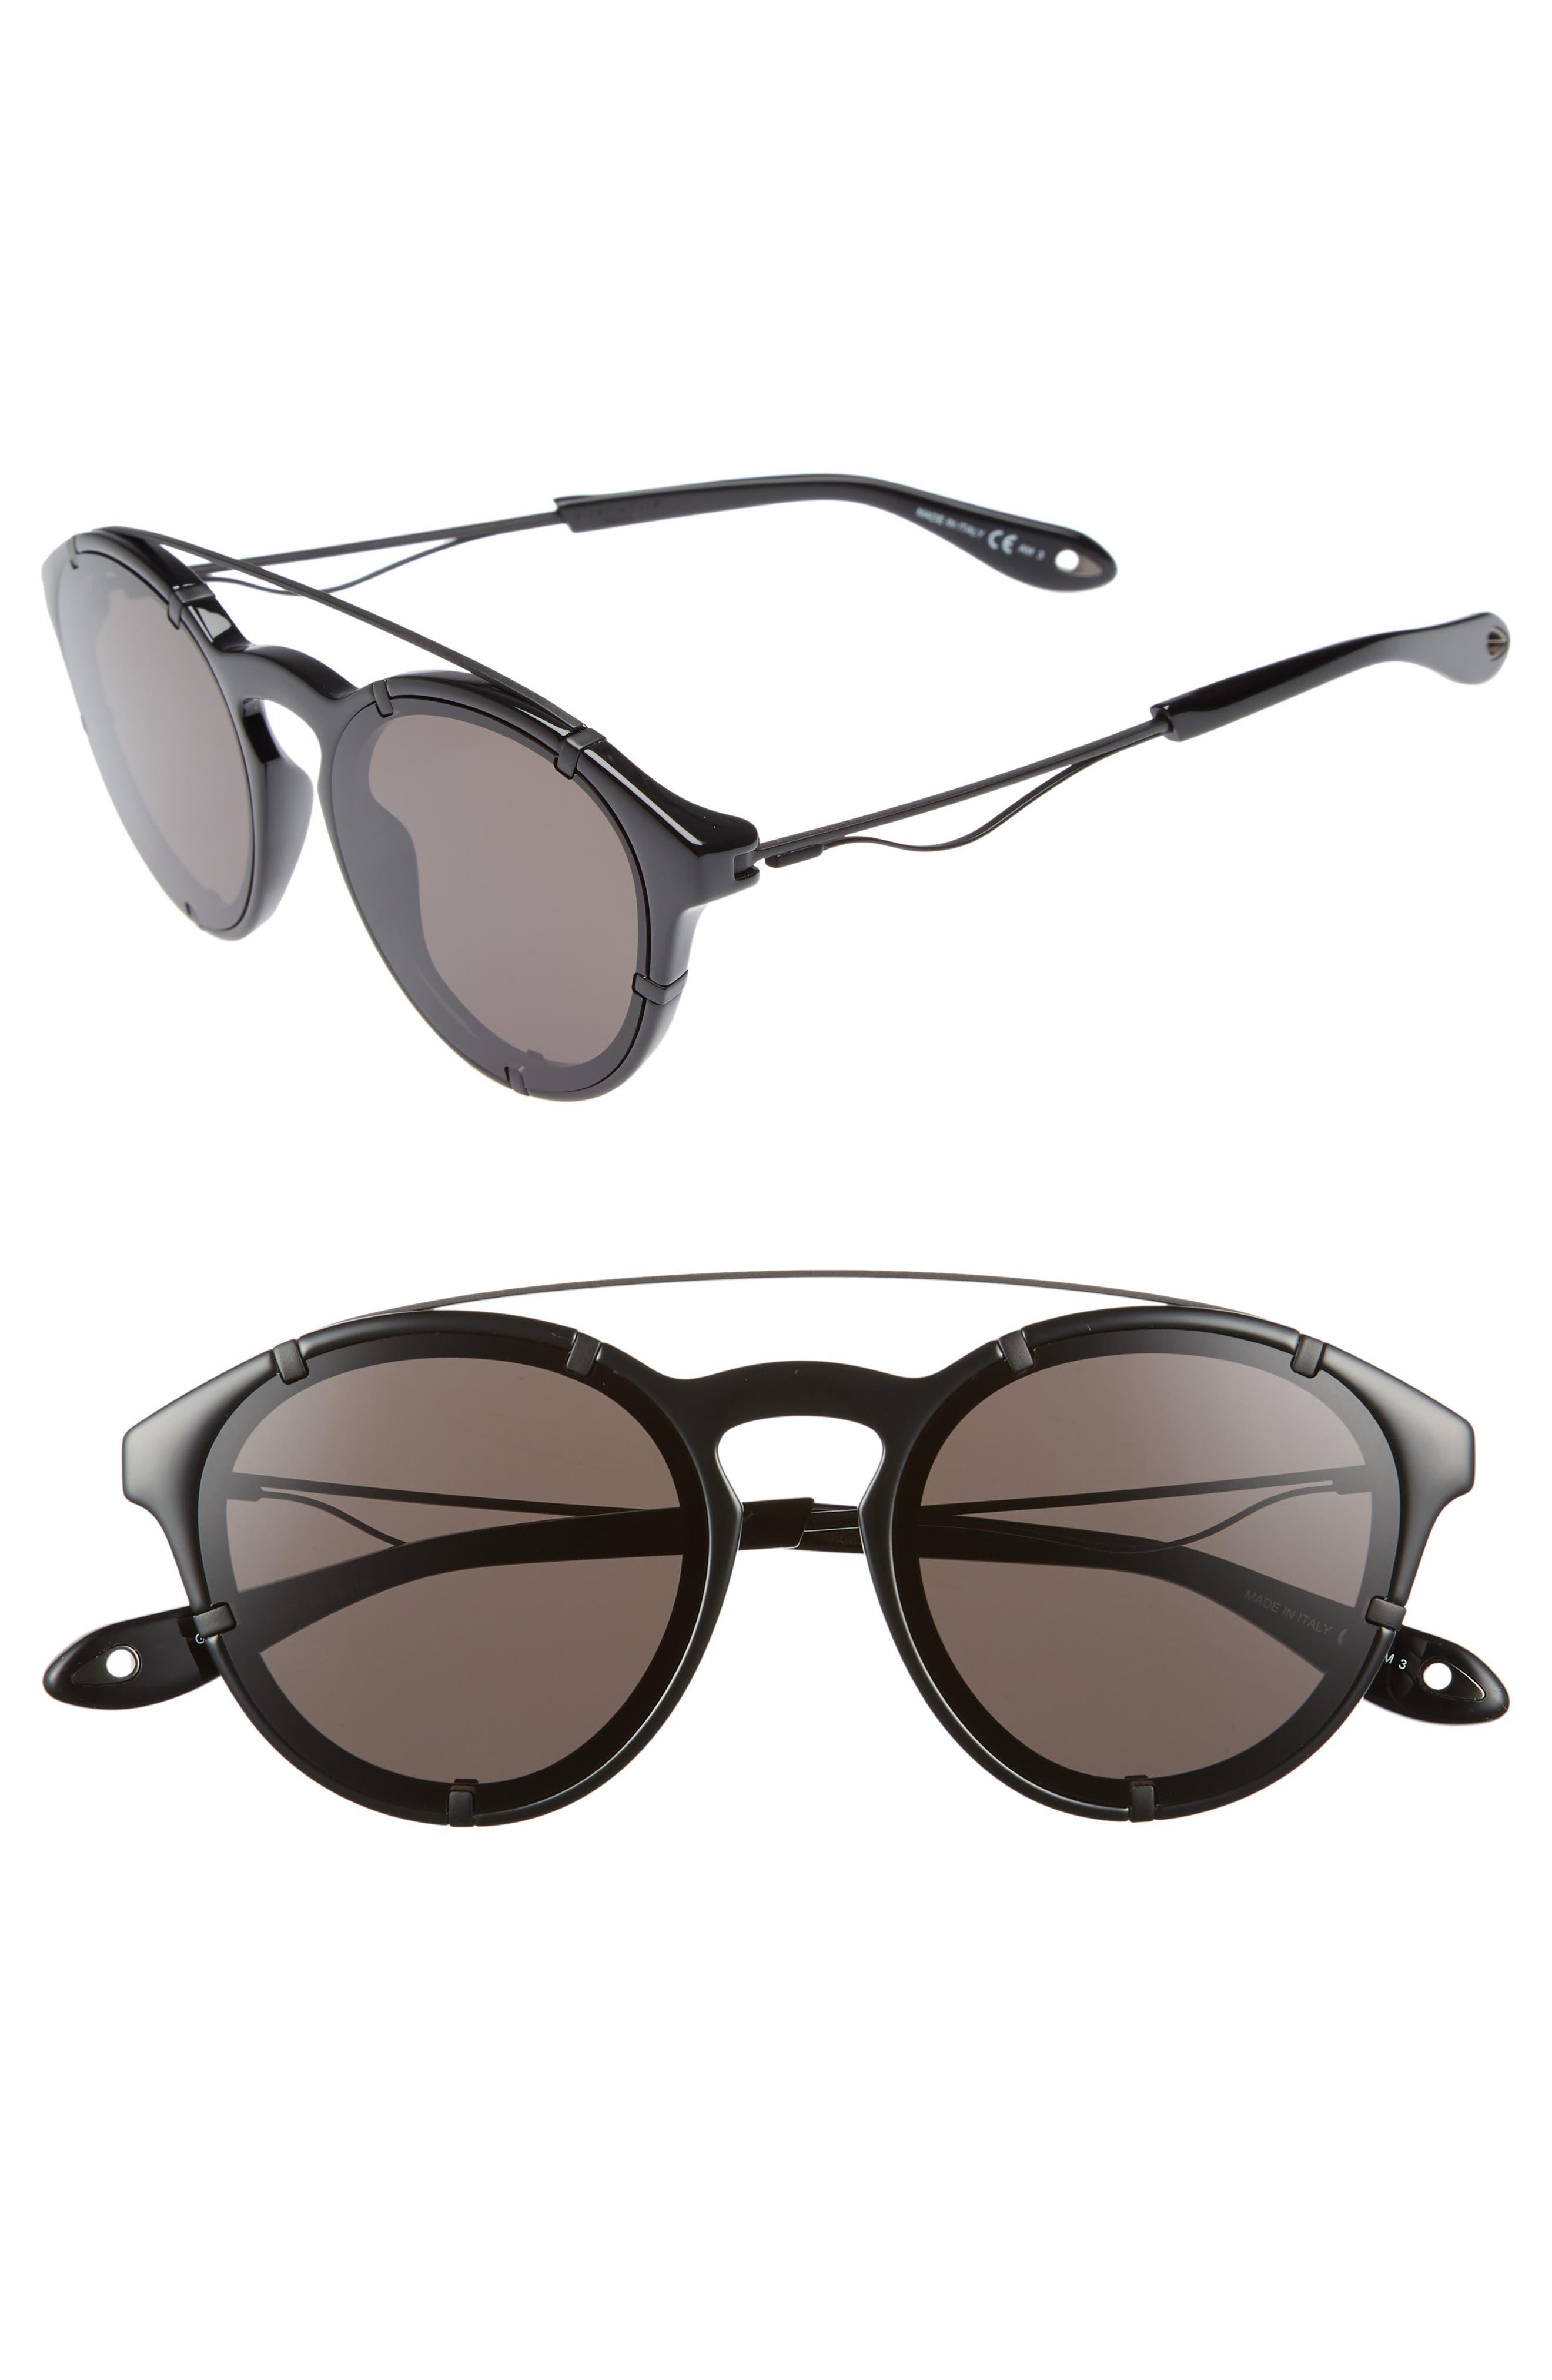 54mm Round Polarized Sunglasses,                         Main,                         color, Black